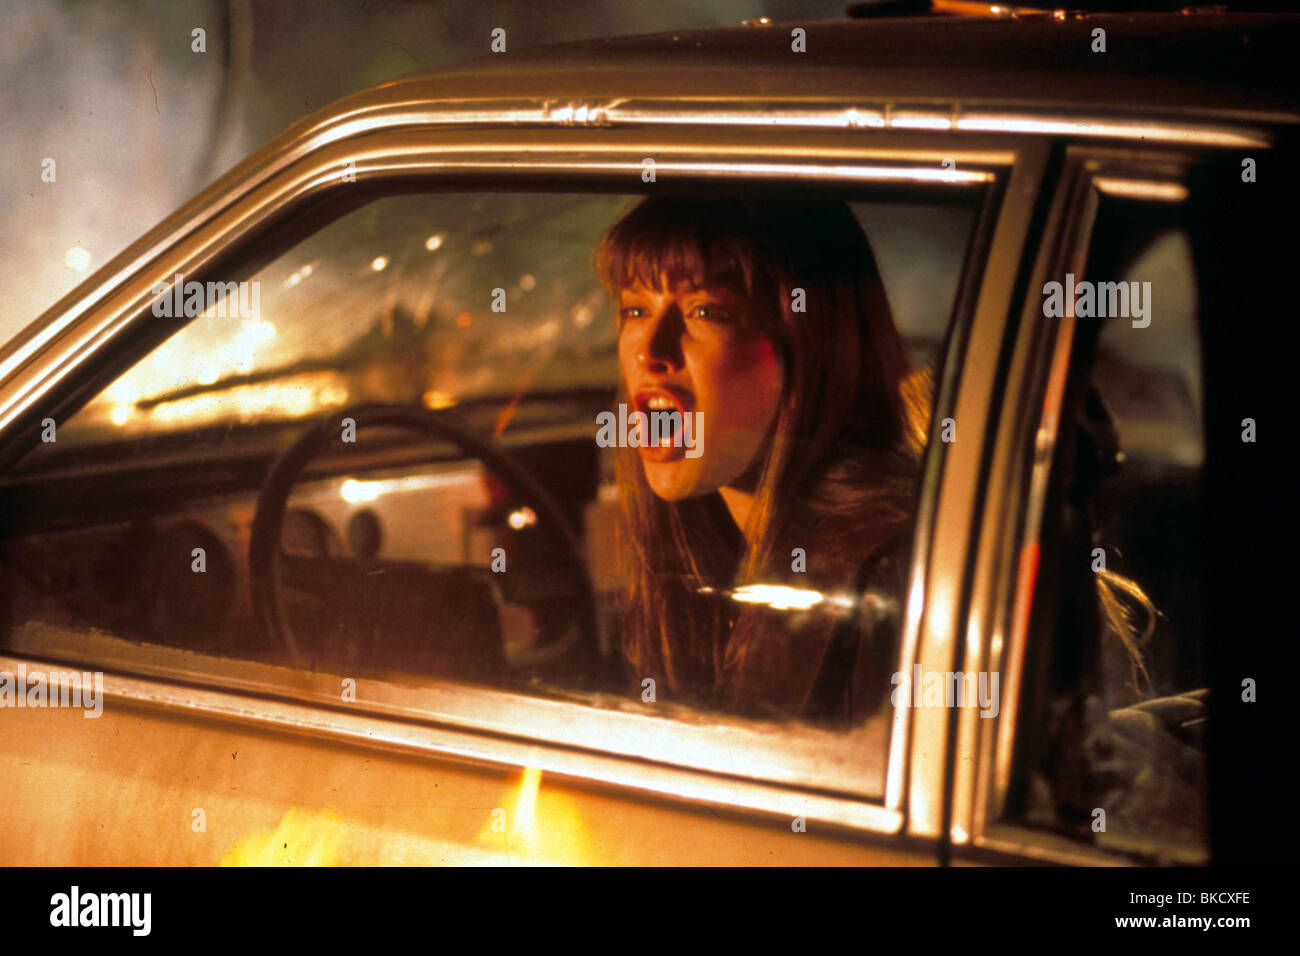 FINAL DESTINATION (2000) AMANDA DETMER FDES 007 - Stock Image